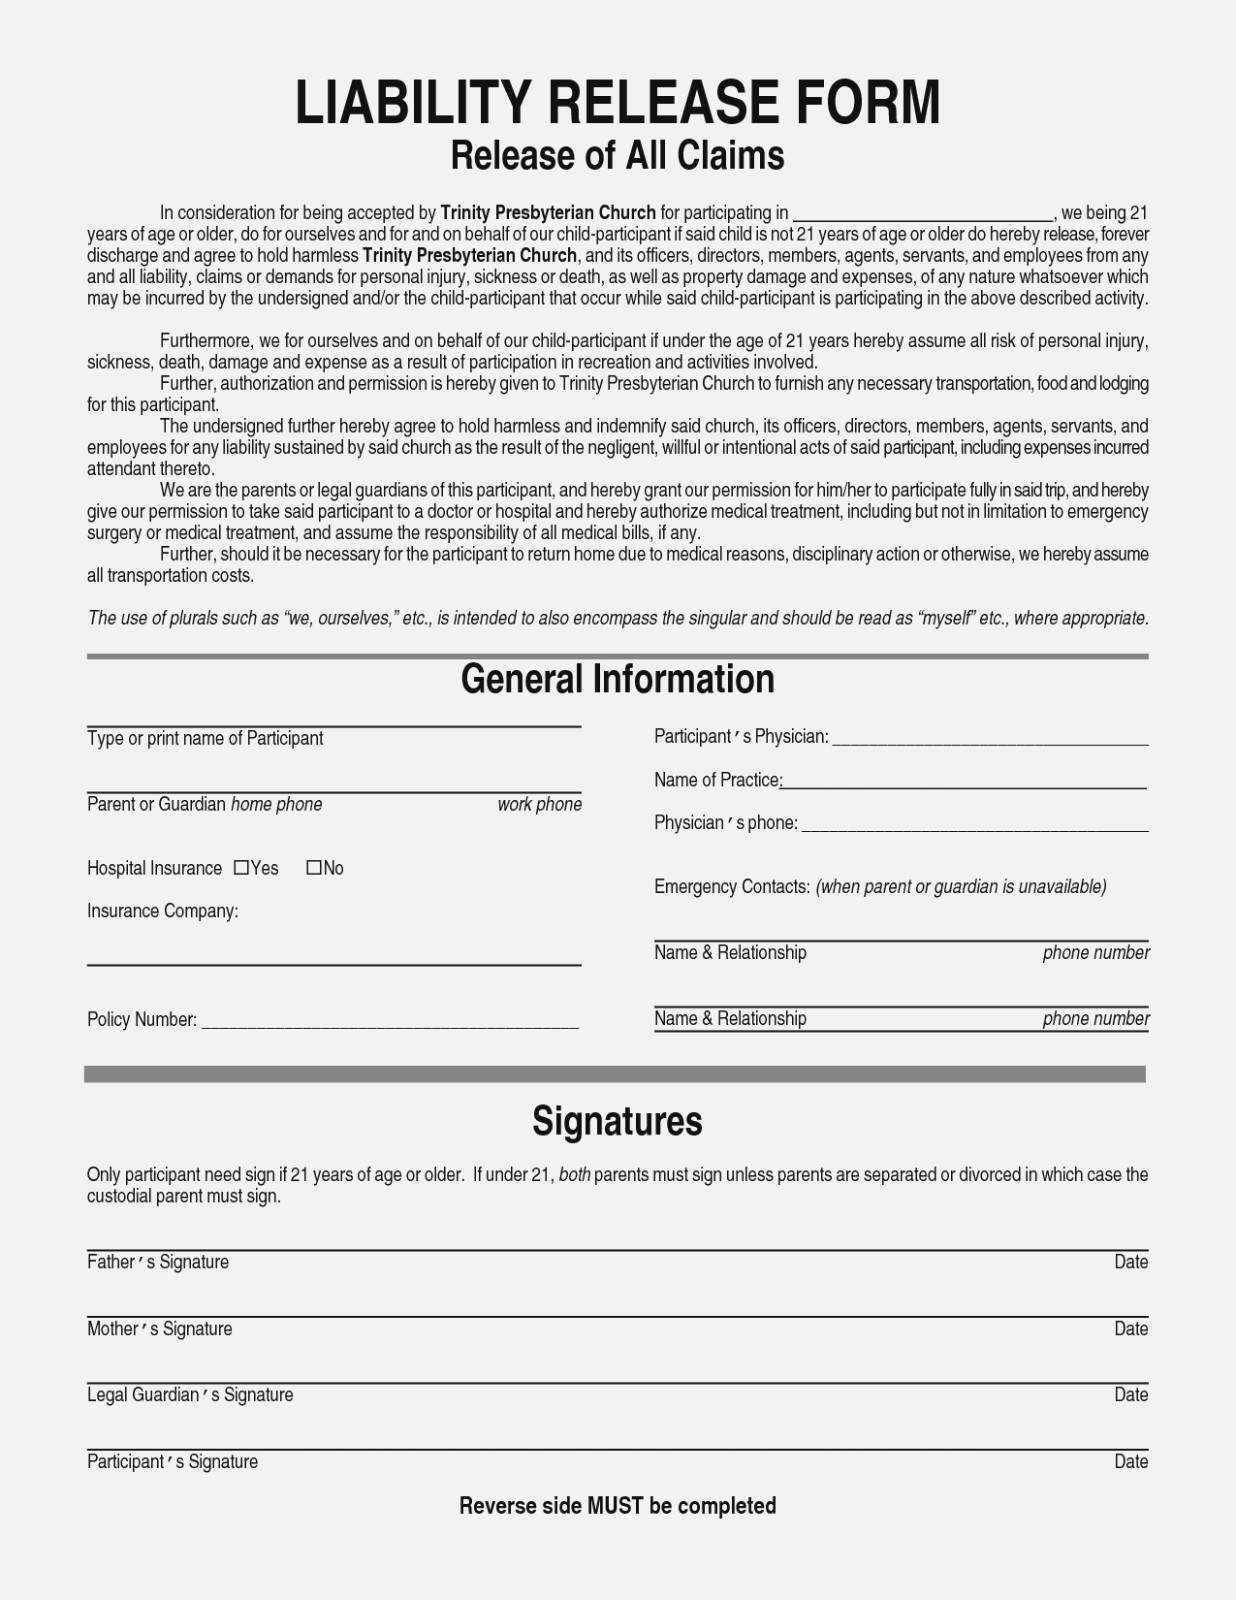 Liability Release Form Template Australia